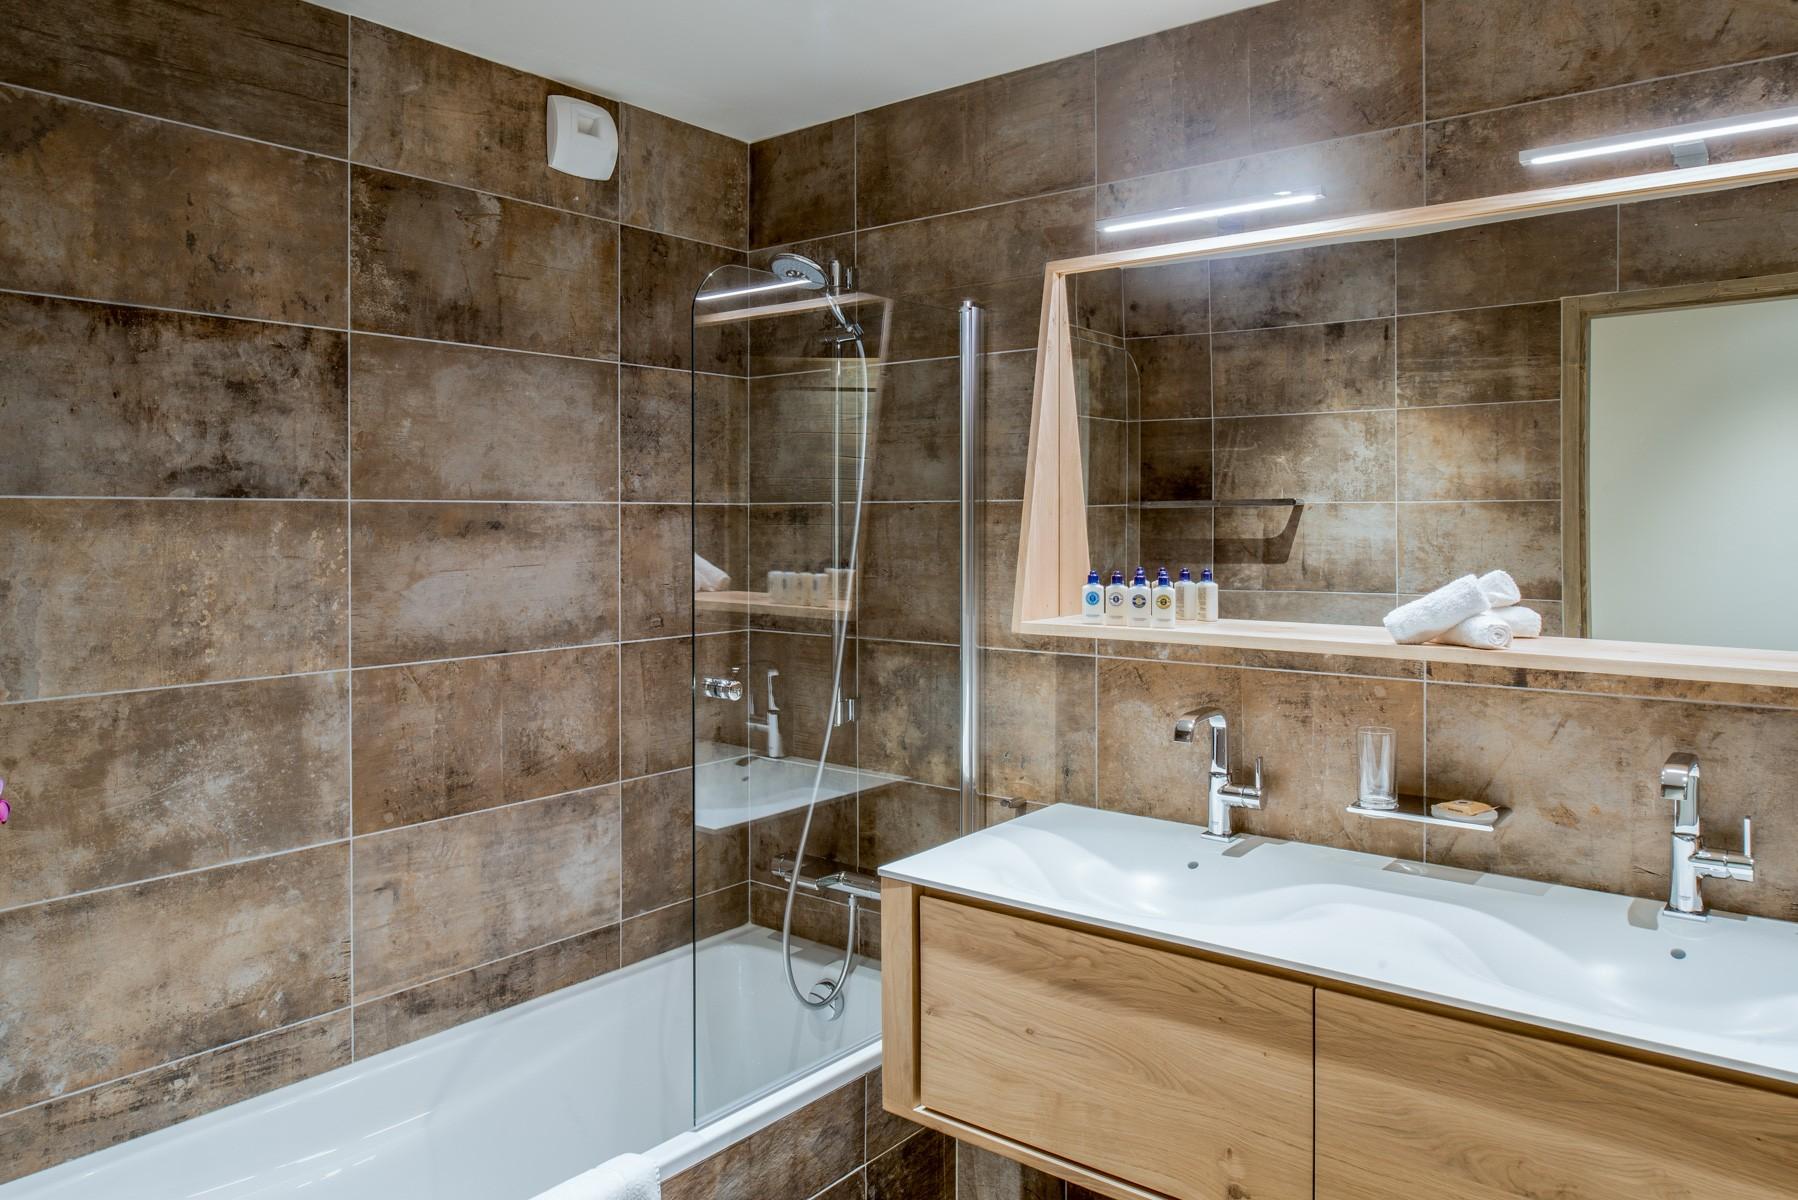 Courchevel 1650 Location Appartement Luxe Amurile Salle De Bain 3